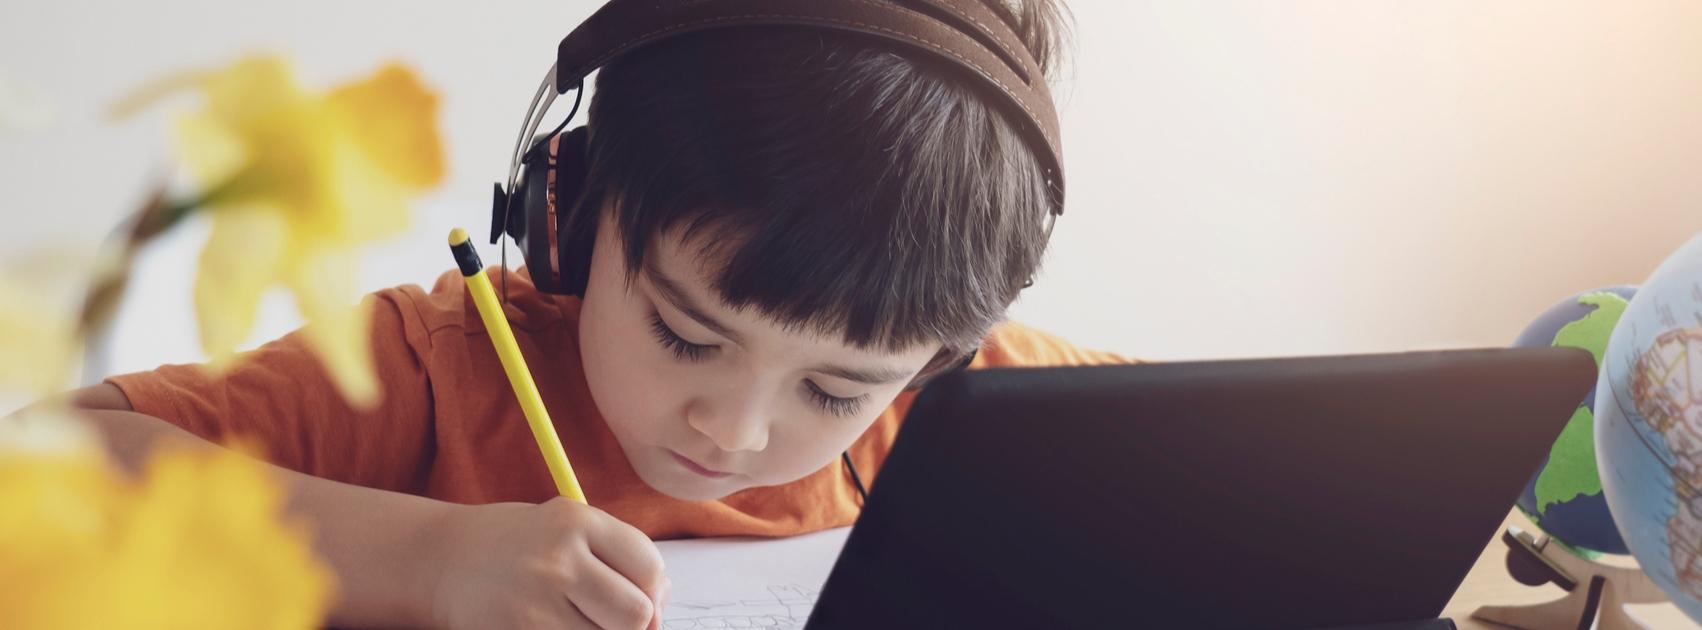 Mediaura Creates E-Learning Platform